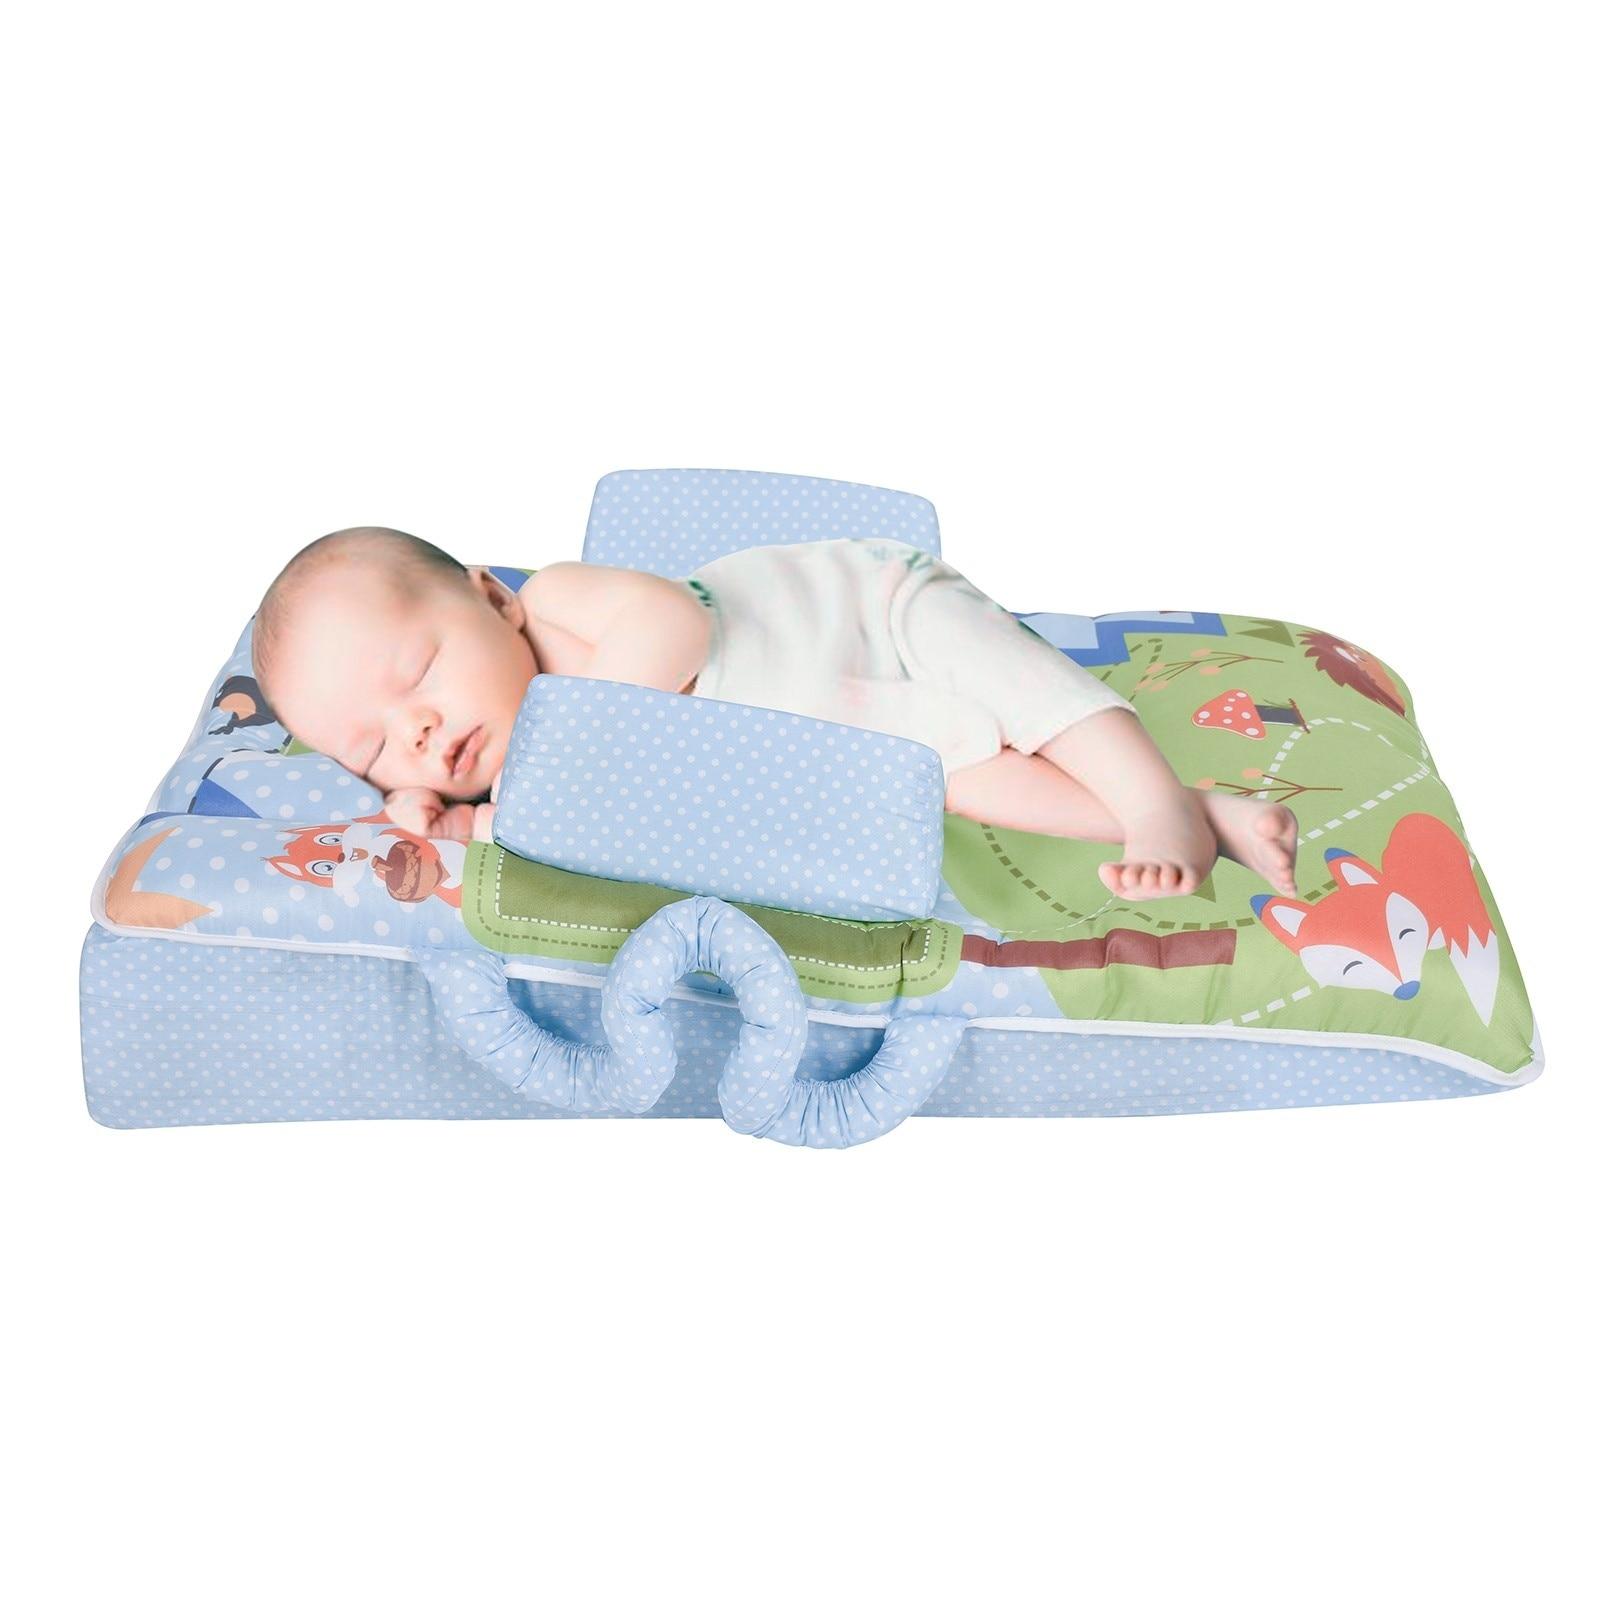 Ebebek Sevi Bebe Baby Lux Reflux Bed